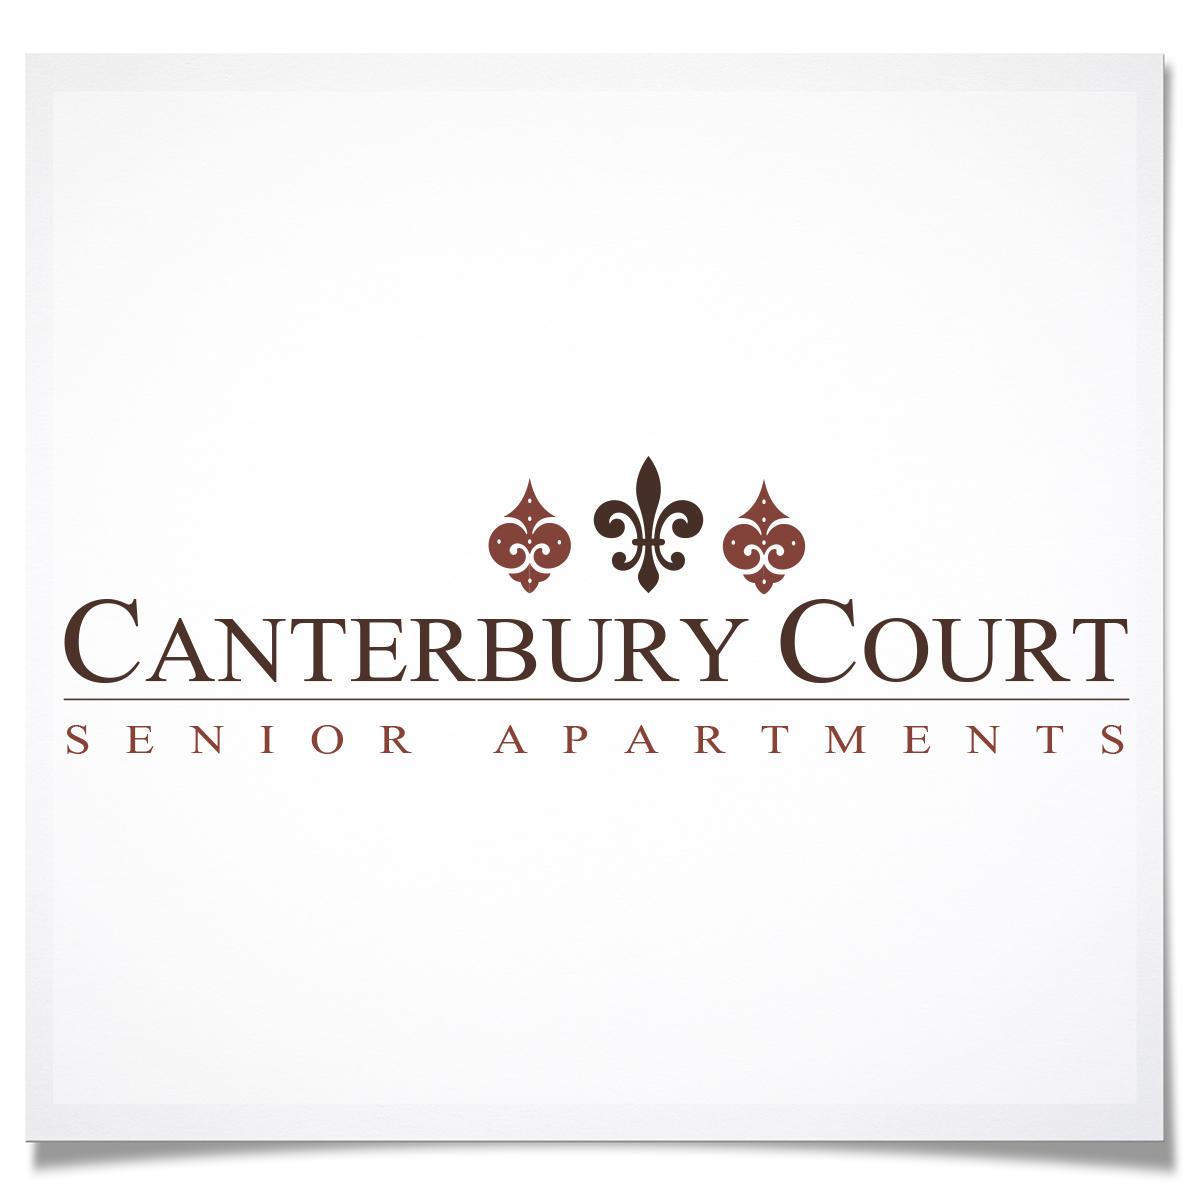 Canterbury Court Senior Apartments - Chula Vista, CA - Retirement Communities